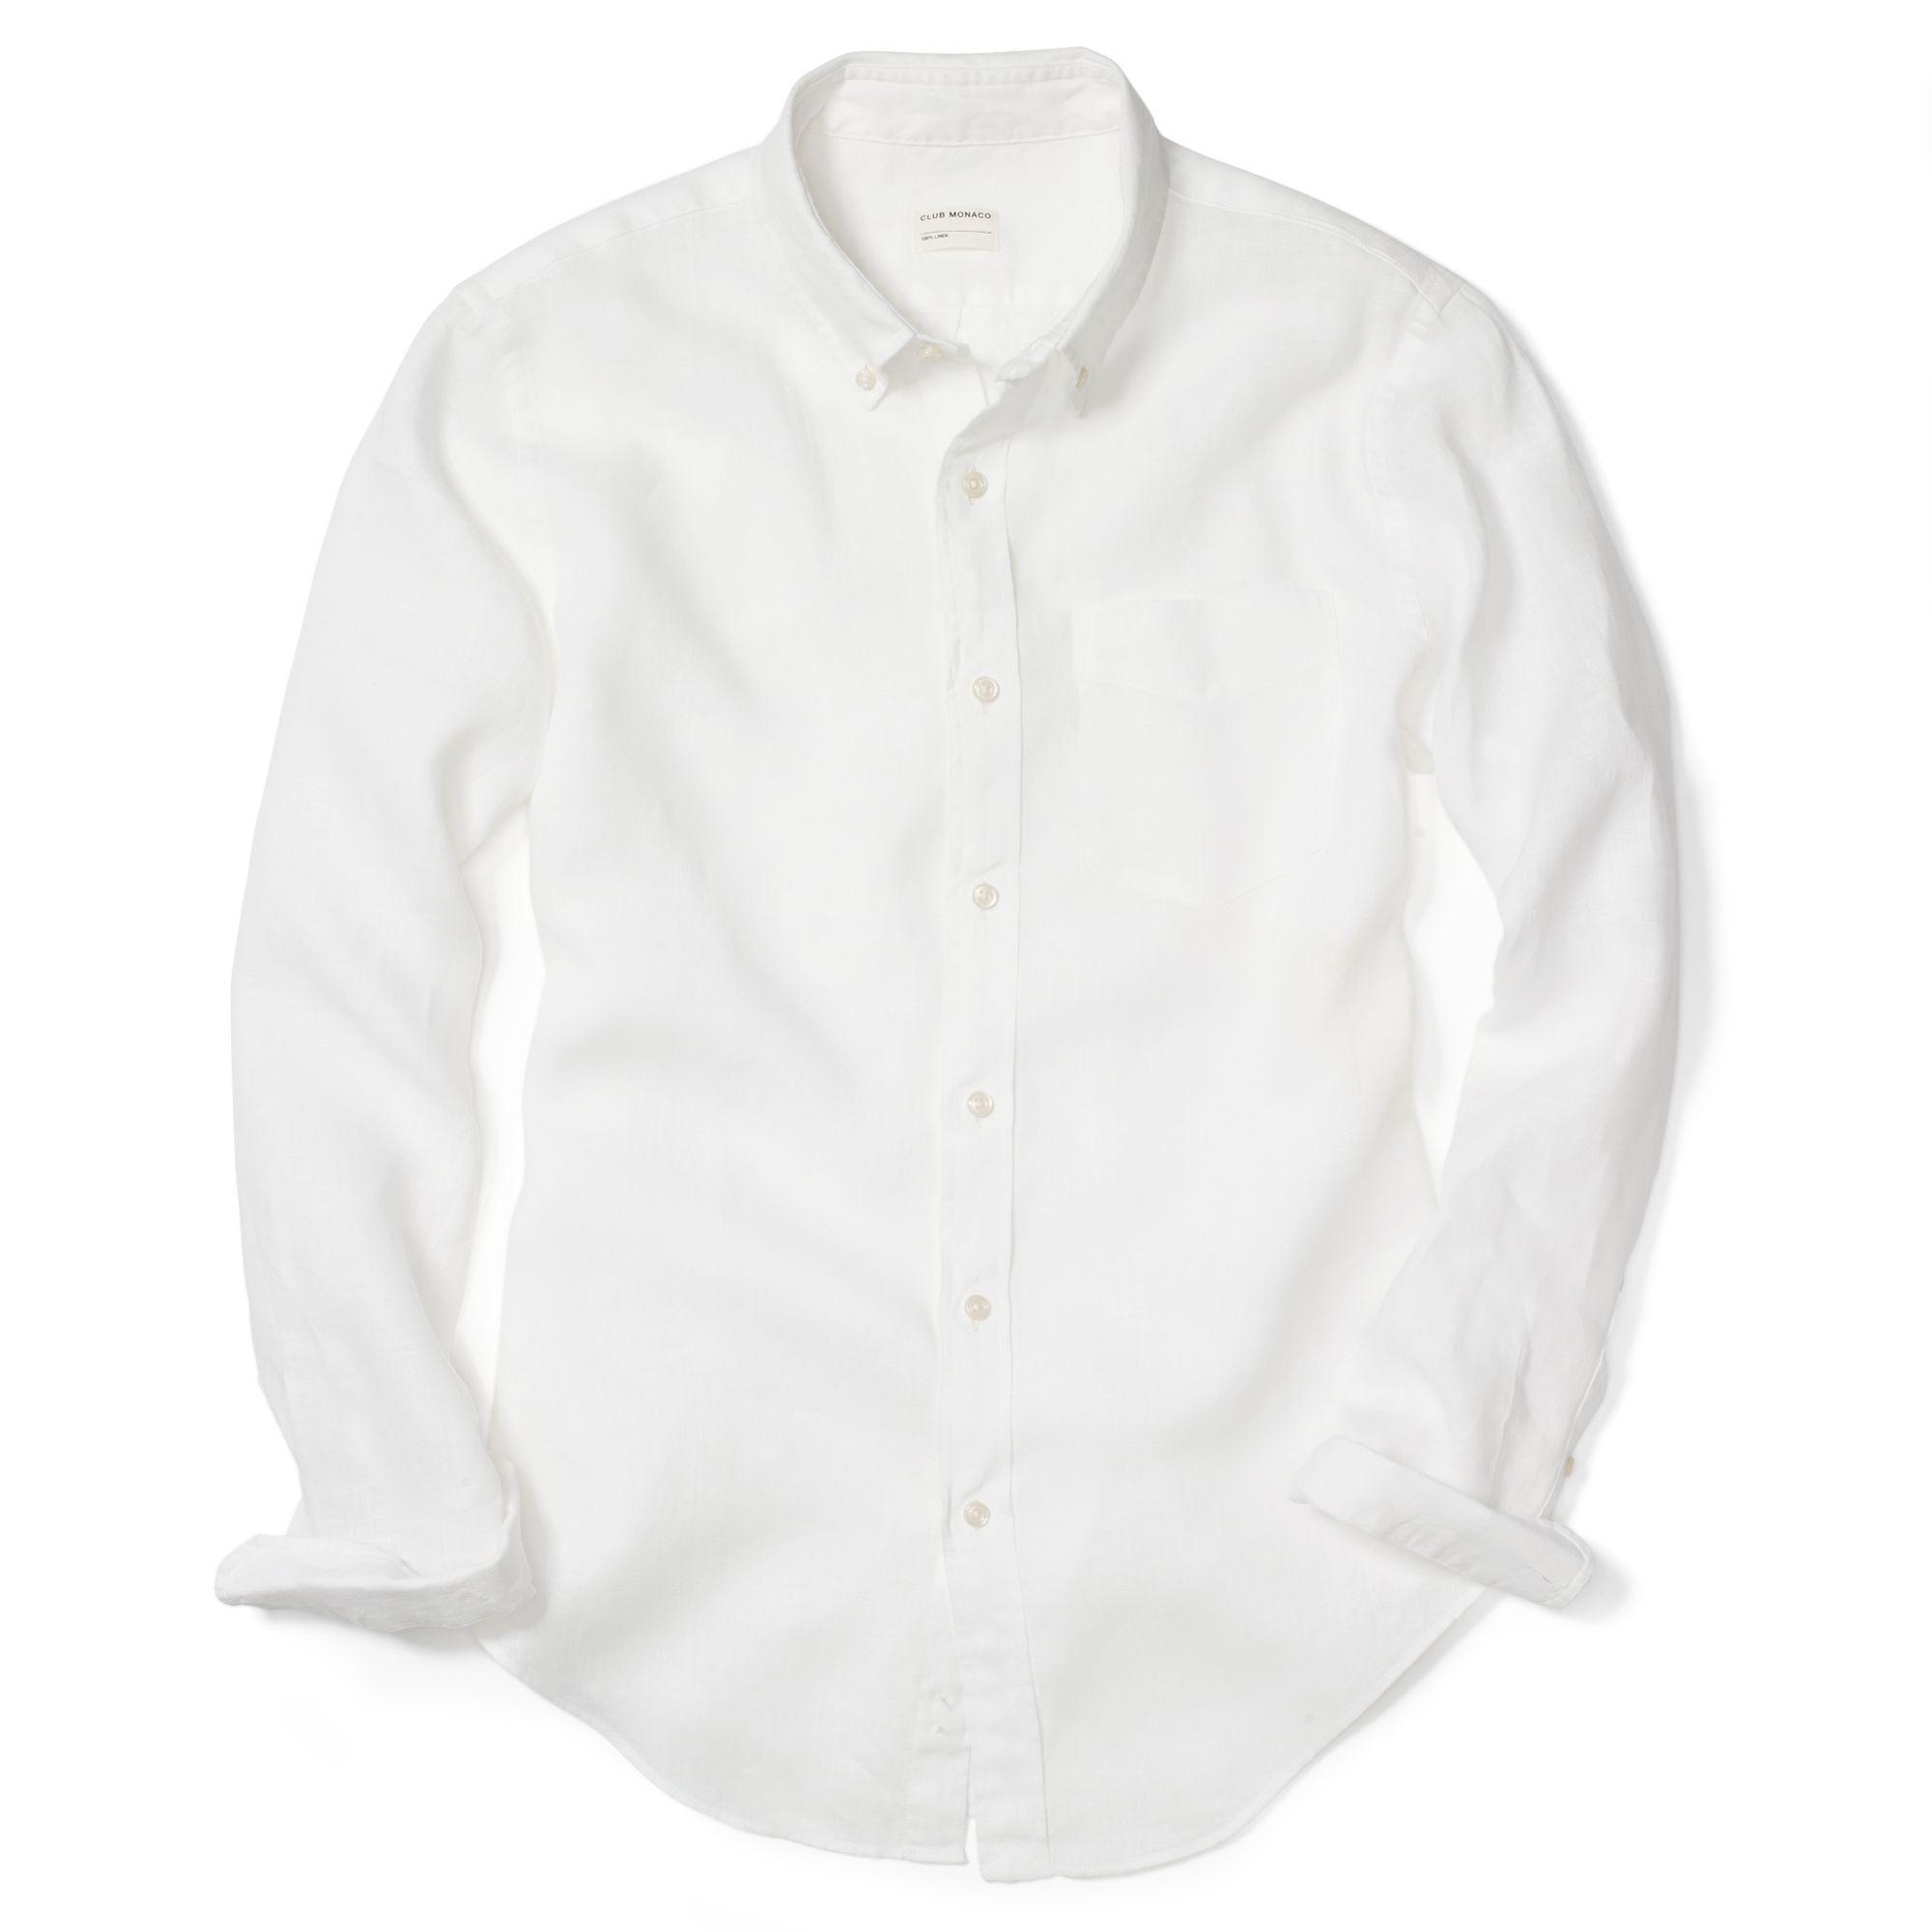 Banana Republic Mens Linen Shirt